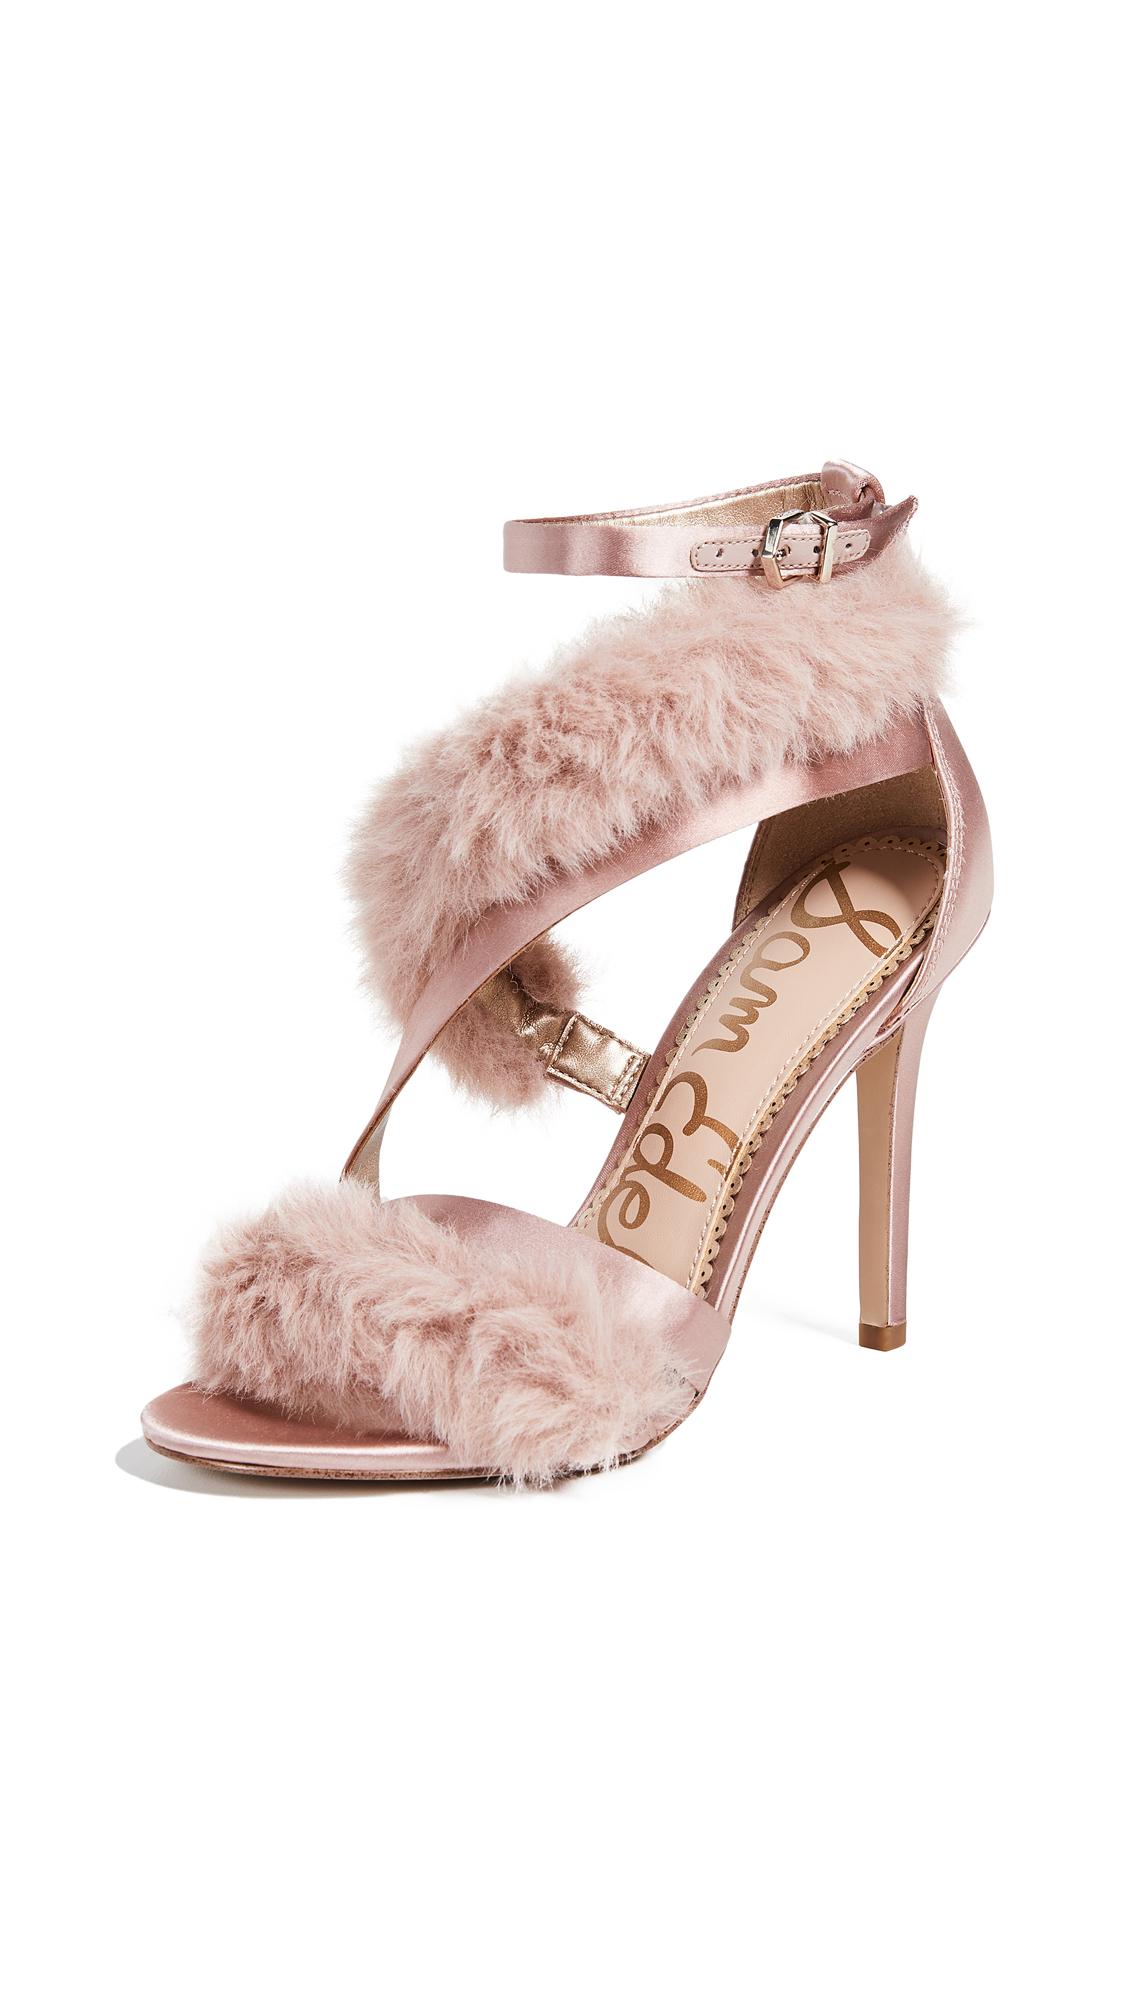 Sam Edelman Adelle Sandals In Crystal Pink